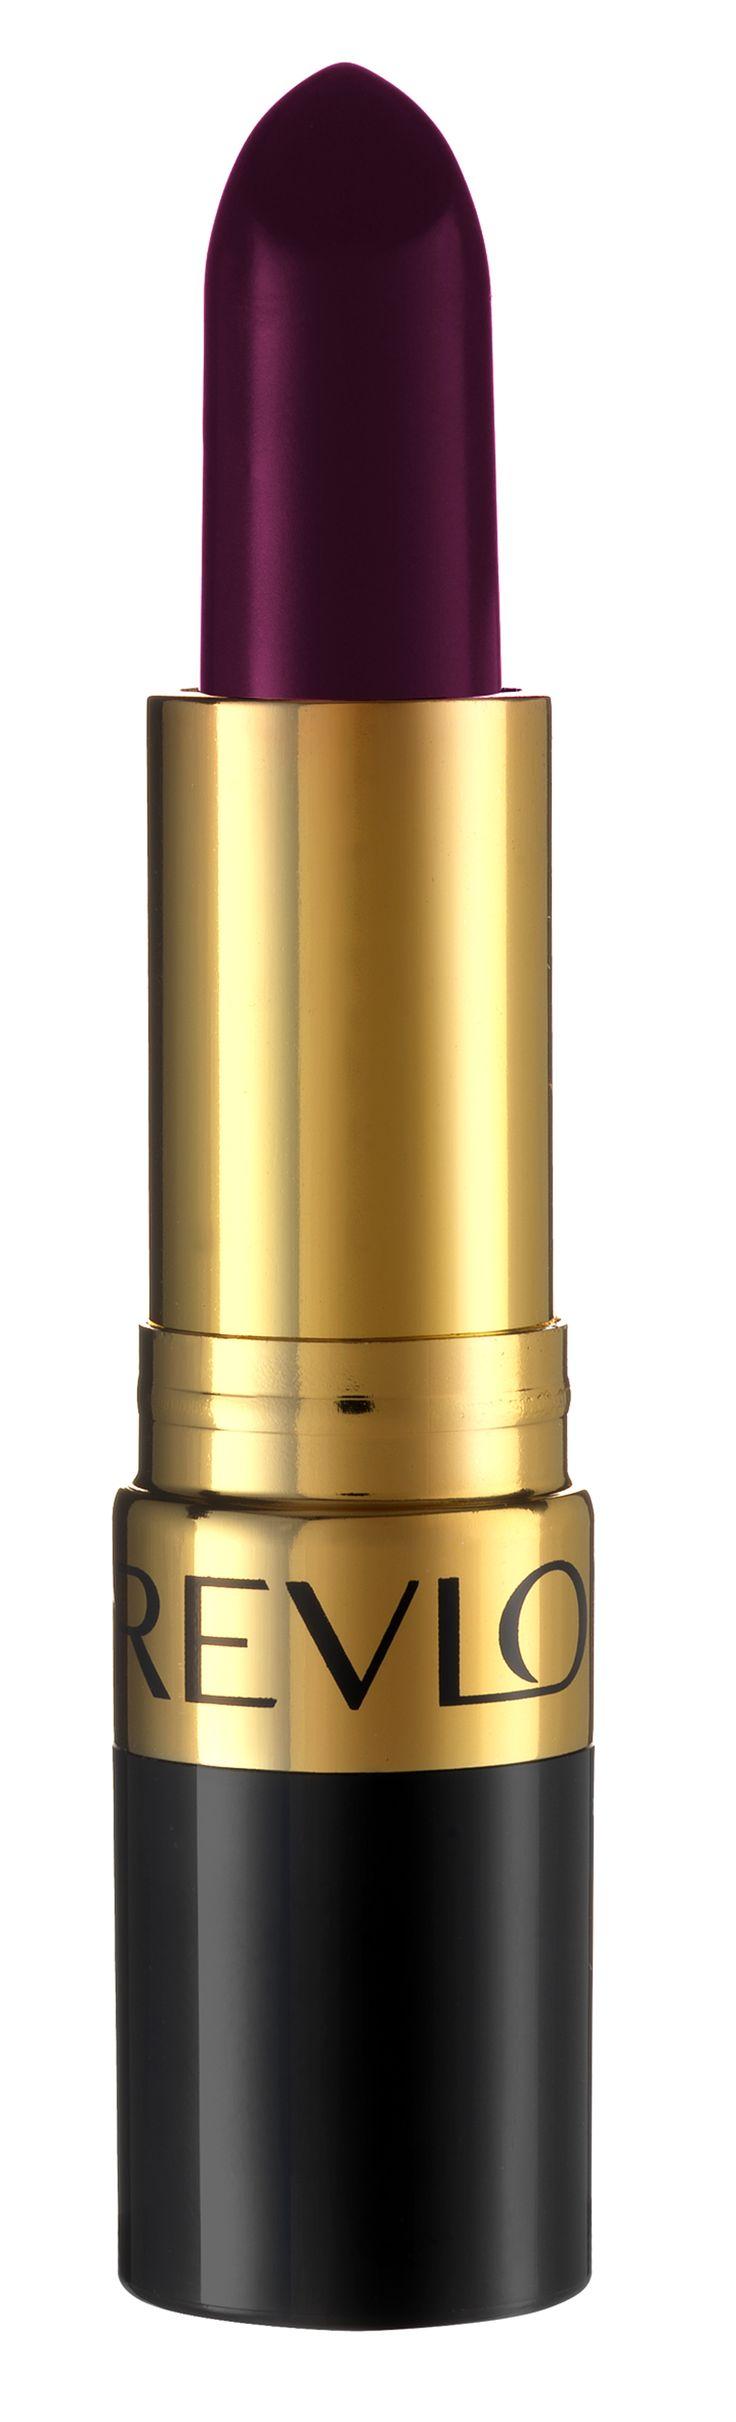 Revlon Super Lustrous Lipstick - Va Va Violet a must have for winter!